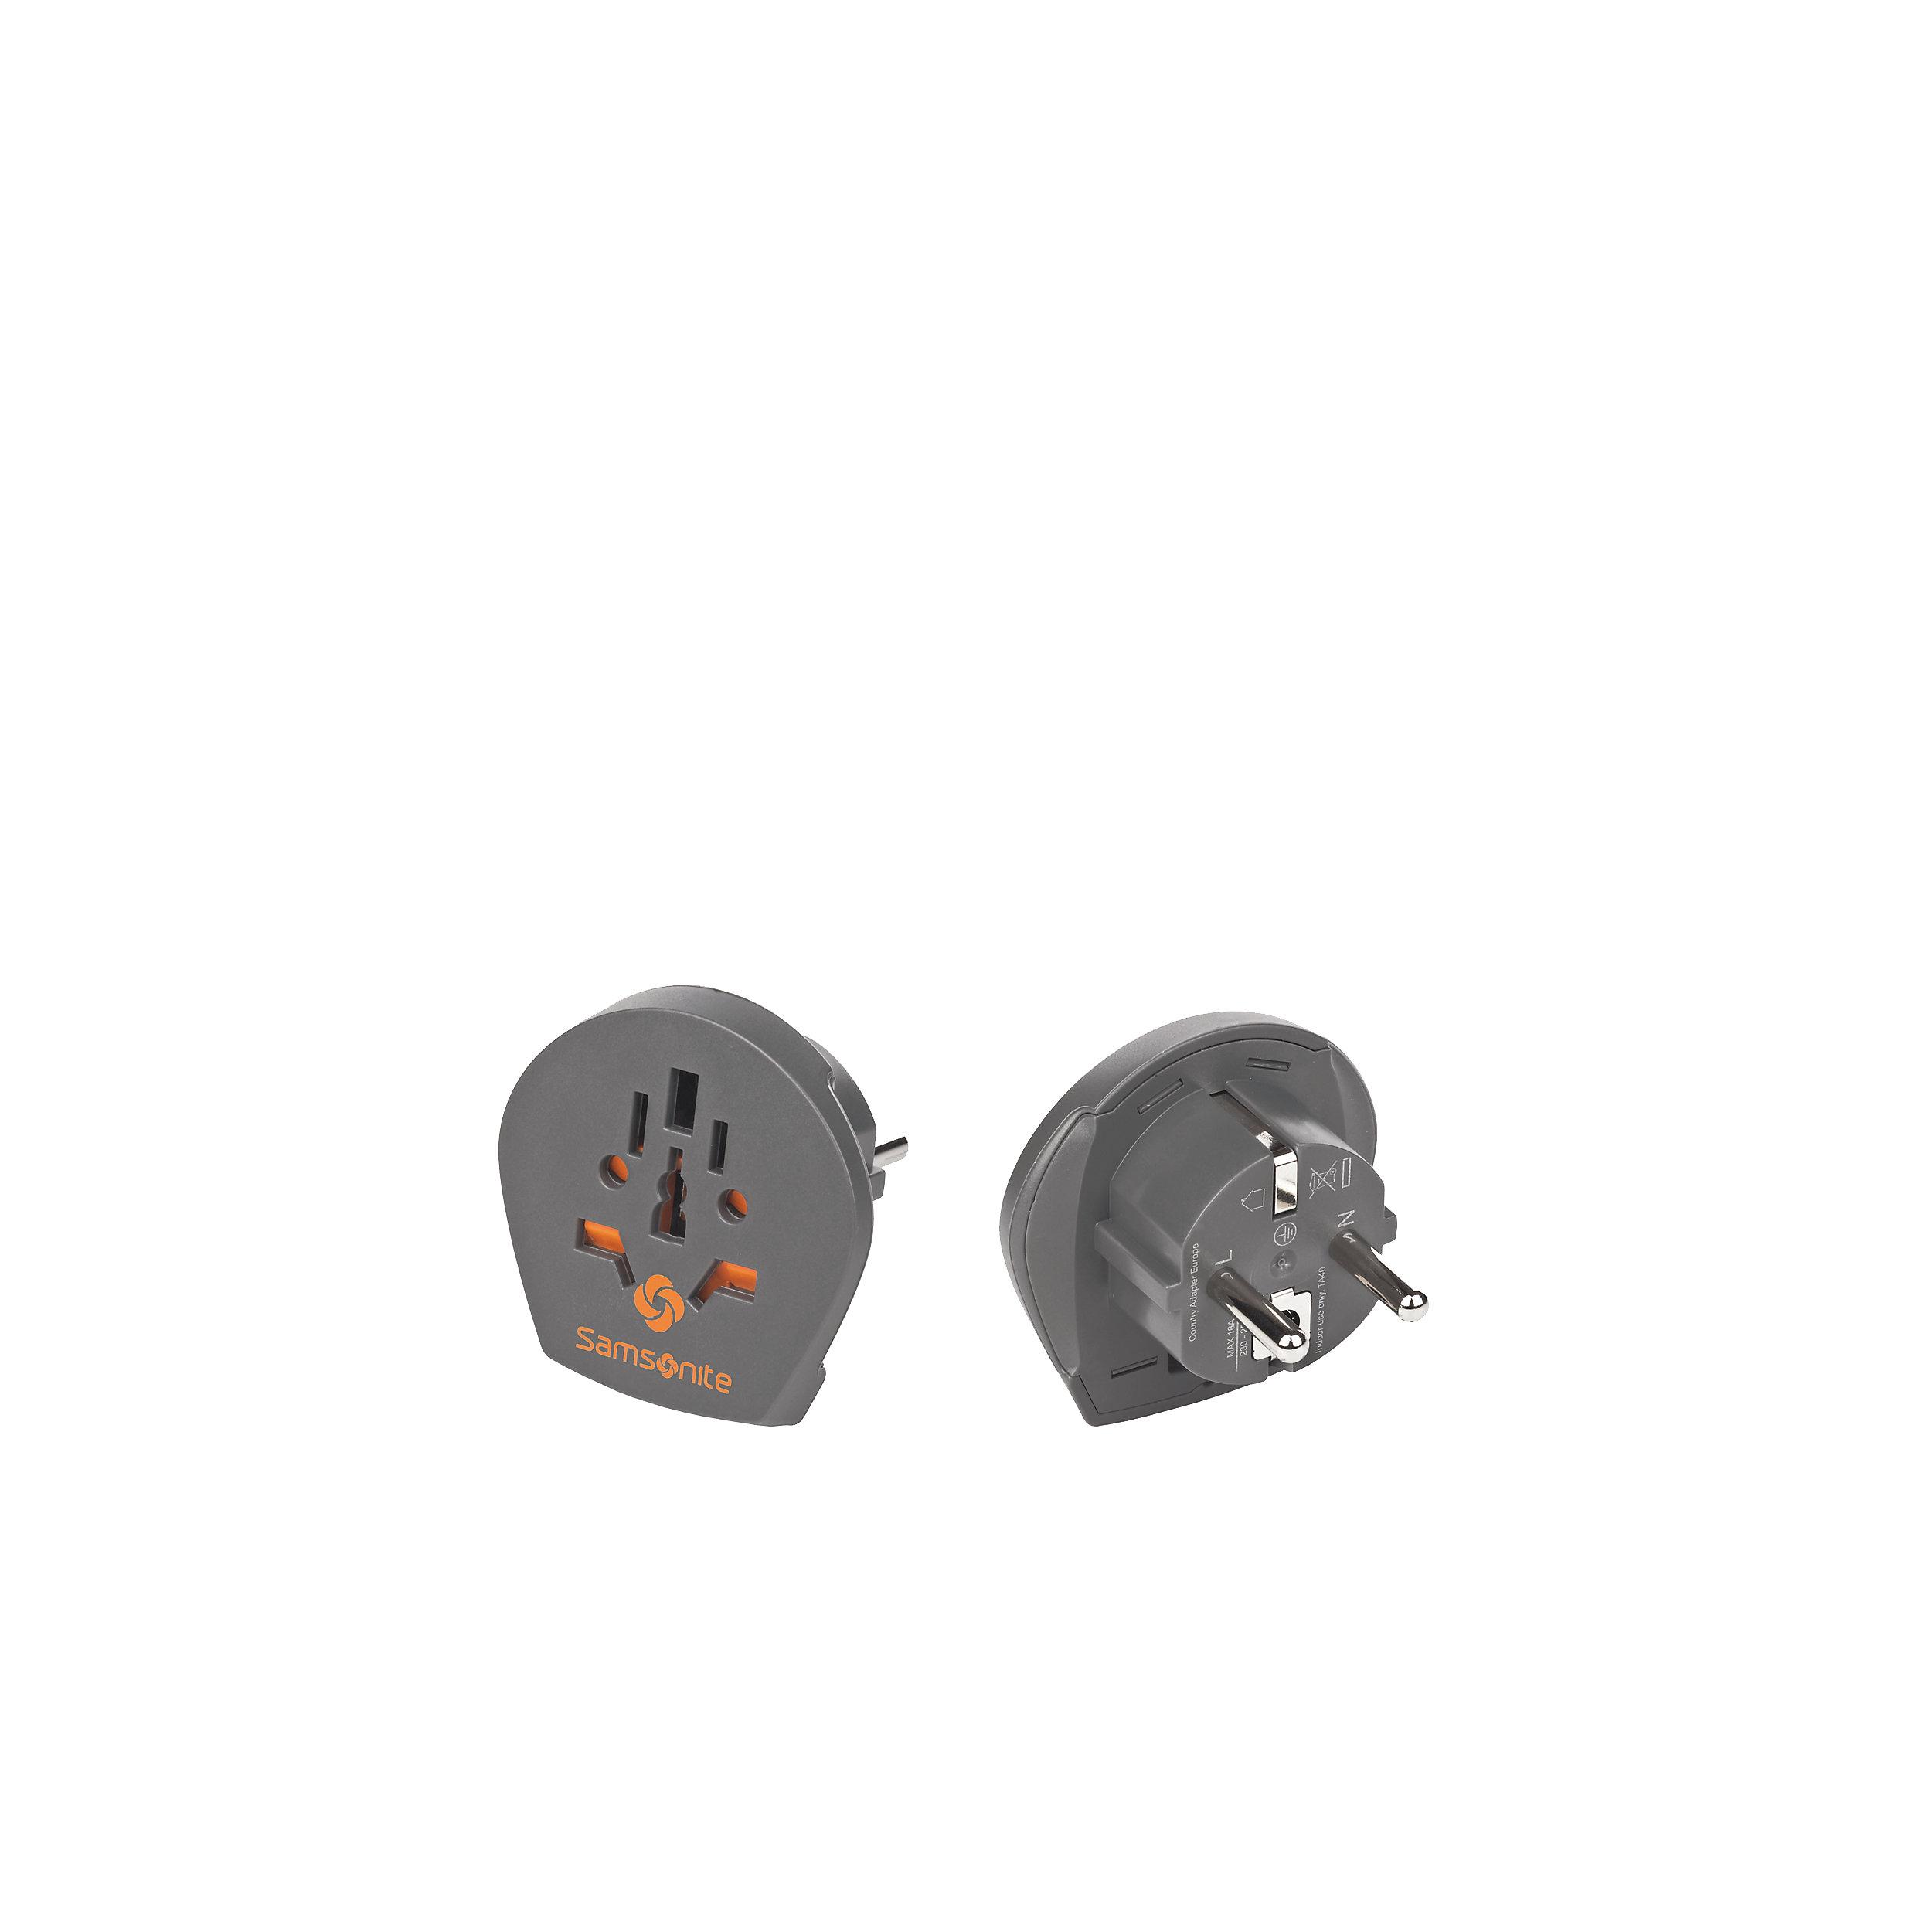 Adapter weltweit/Europa 2 Electronics Accessories